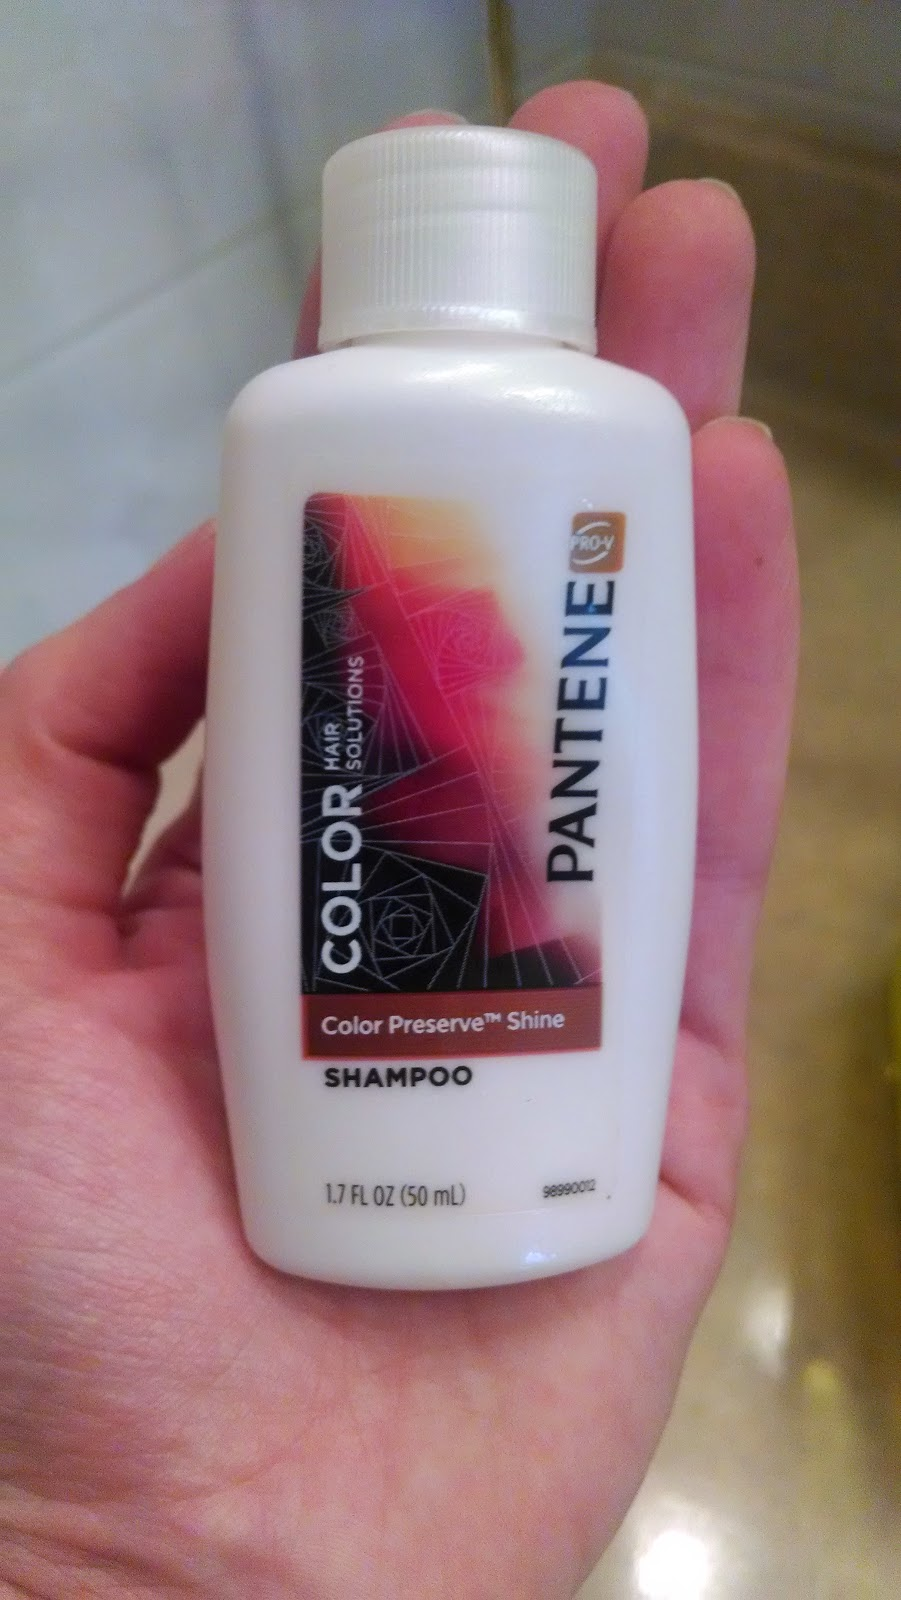 Pantene Color Preserve Shampoo